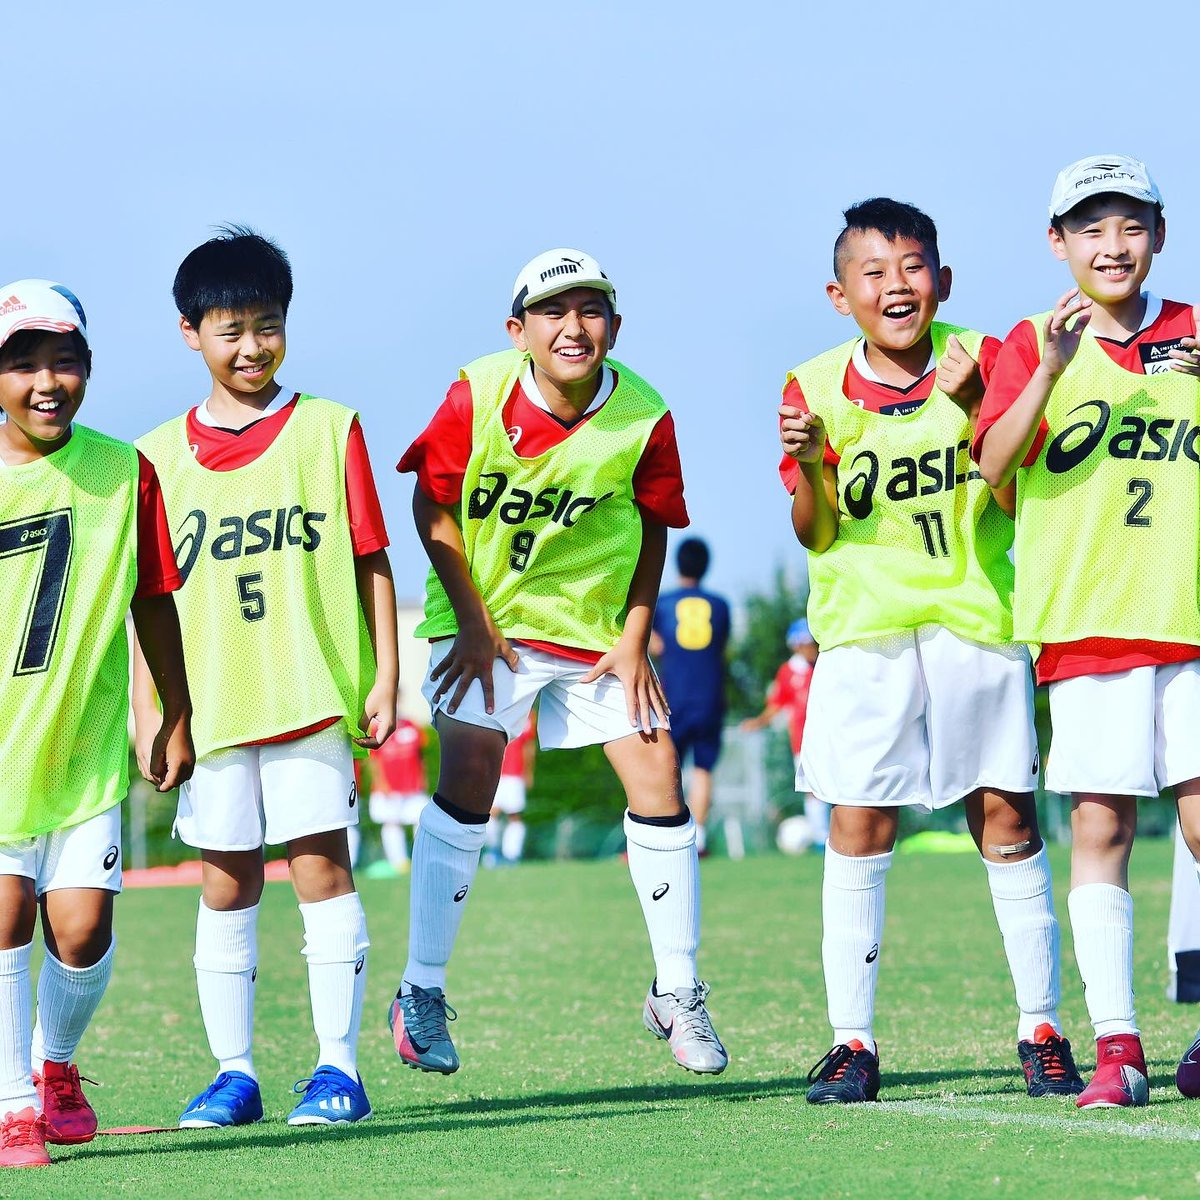 📍Campus de Verano #Iniestamethodology: fútbol y diversión ⚽️😃  サマーキャンプ #Iniestamethodology :サッカーをエンジョイ⚽️😊  #Japan #Football #FootballAcademy #Discipline #Learning #TeamWork #GreenSakai #Amagasaki #Kobe #PortIsland #RokkoIsland #Chiba